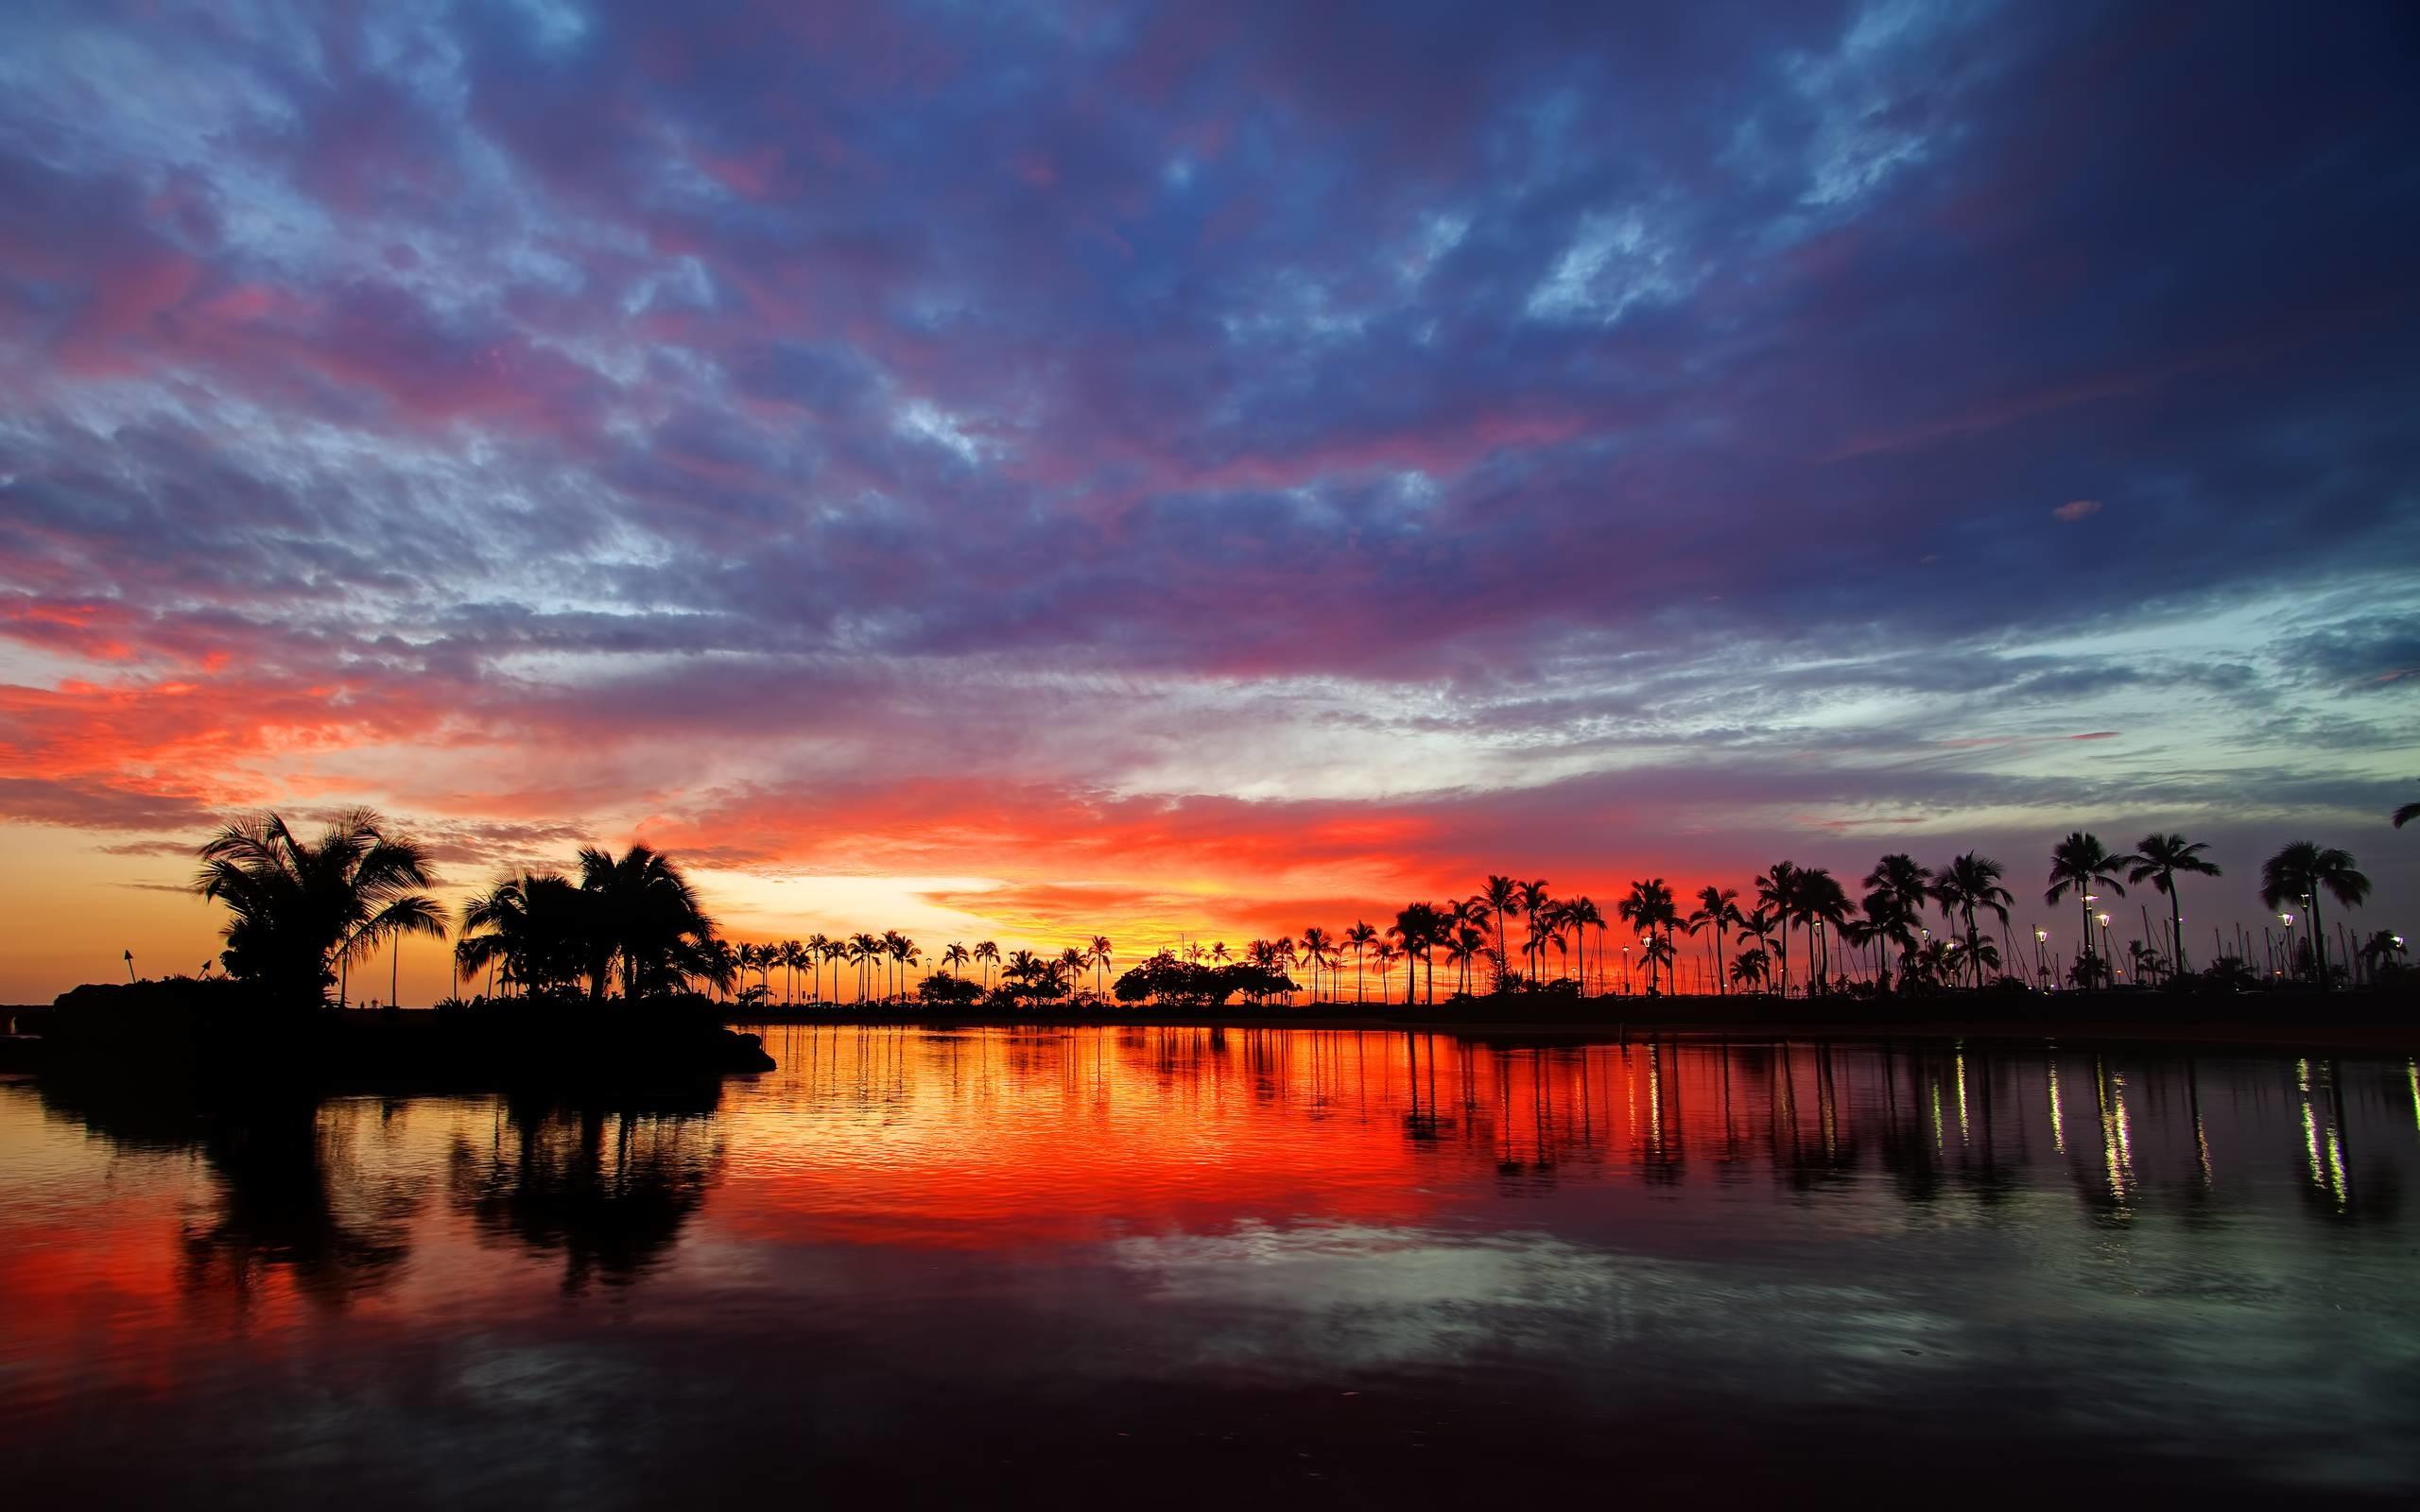 Hawaii Sunset Wallpapers Images 6 HD Wallpapers   Eakai.